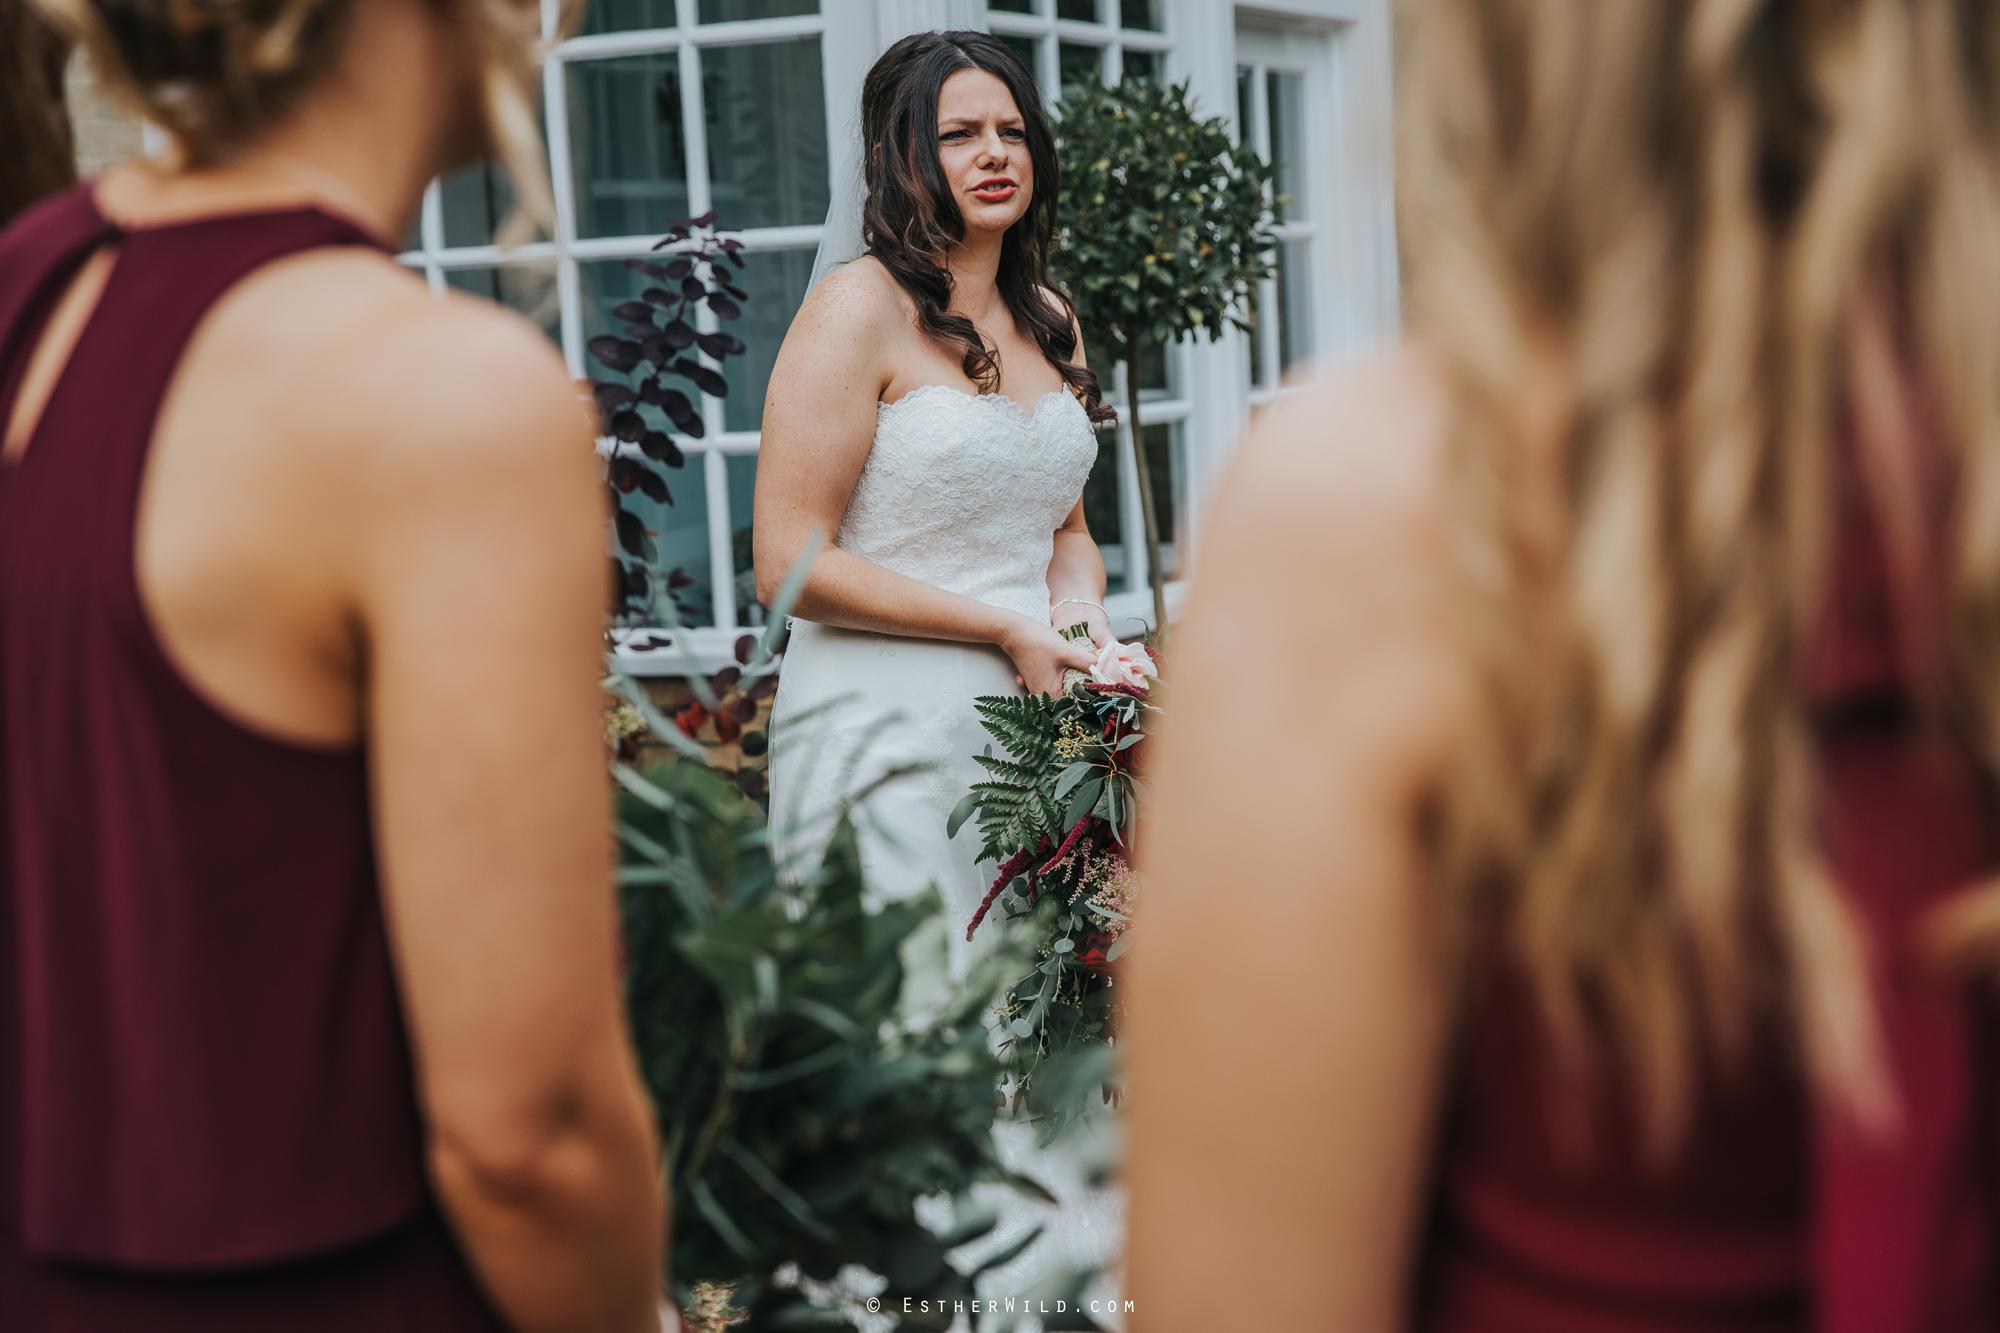 Reading_Room_Weddings_Alby_Norwich_Photographer_Esther_Wild_IMG_0746.jpg